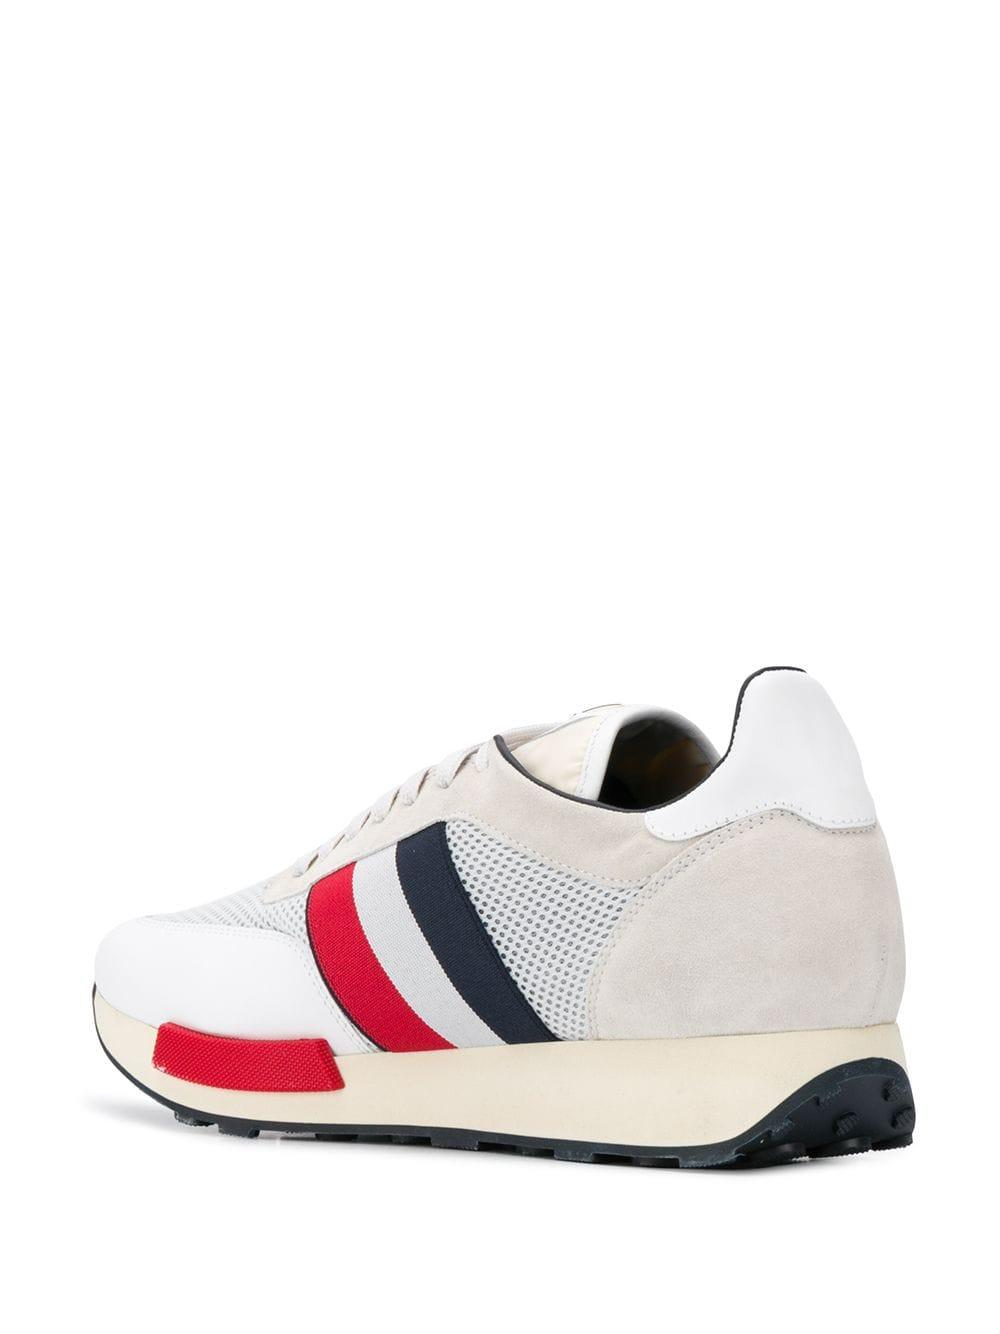 Zapatillas con paneles de malla Moncler de Cuero de color Blanco para hombre